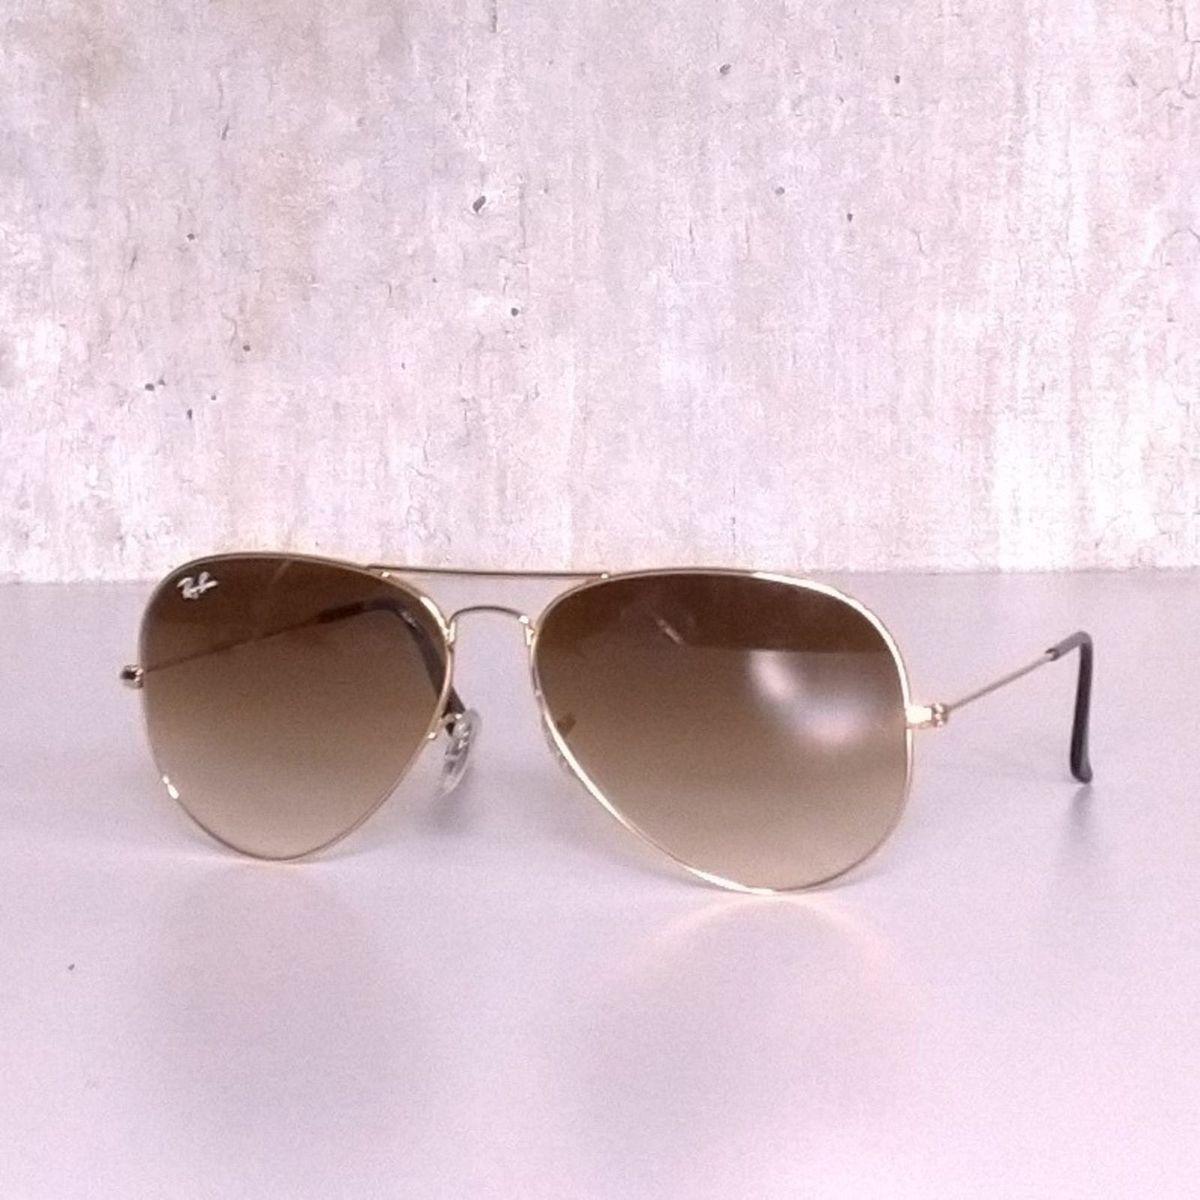 óculos estilo aviador caramelo - óculos rayban.  Czm6ly9wag90b3muzw5qb2vplmnvbs5ici9wcm9kdwn0cy83mzk0mtqxlzizzjewowm4ztm2mgfloweyoteyndnhztg2otzhzdu0lmpwzw  ... 05bf00f2c9